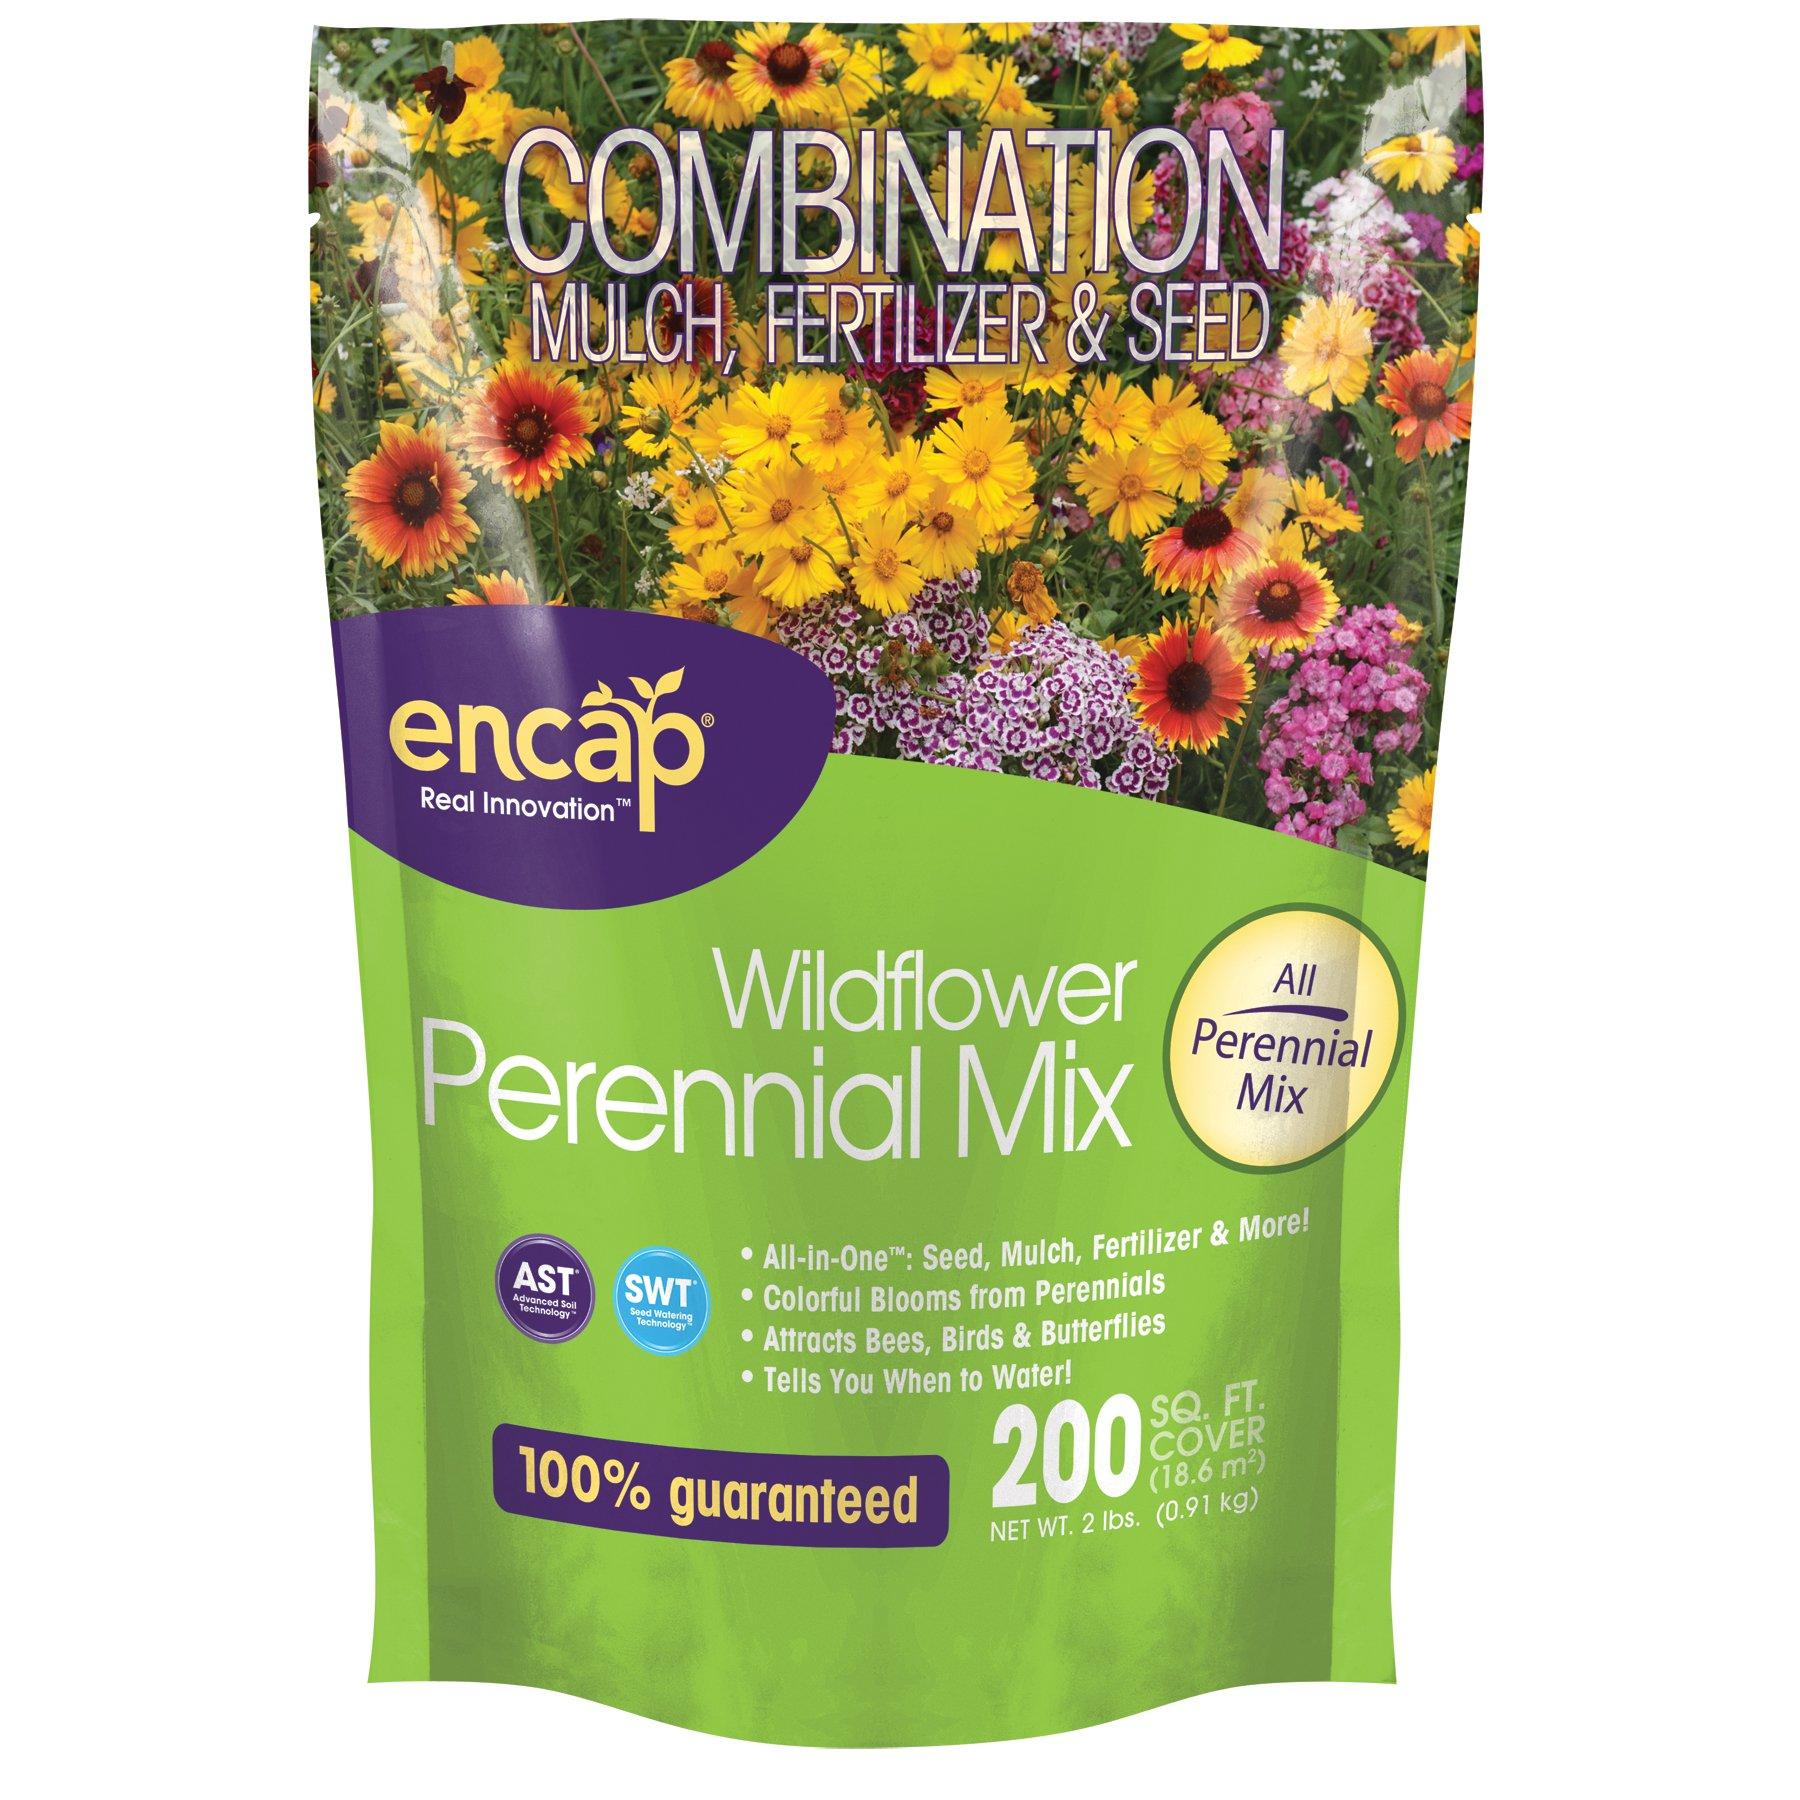 Encap Wildflower Perennial Mix - 2lb